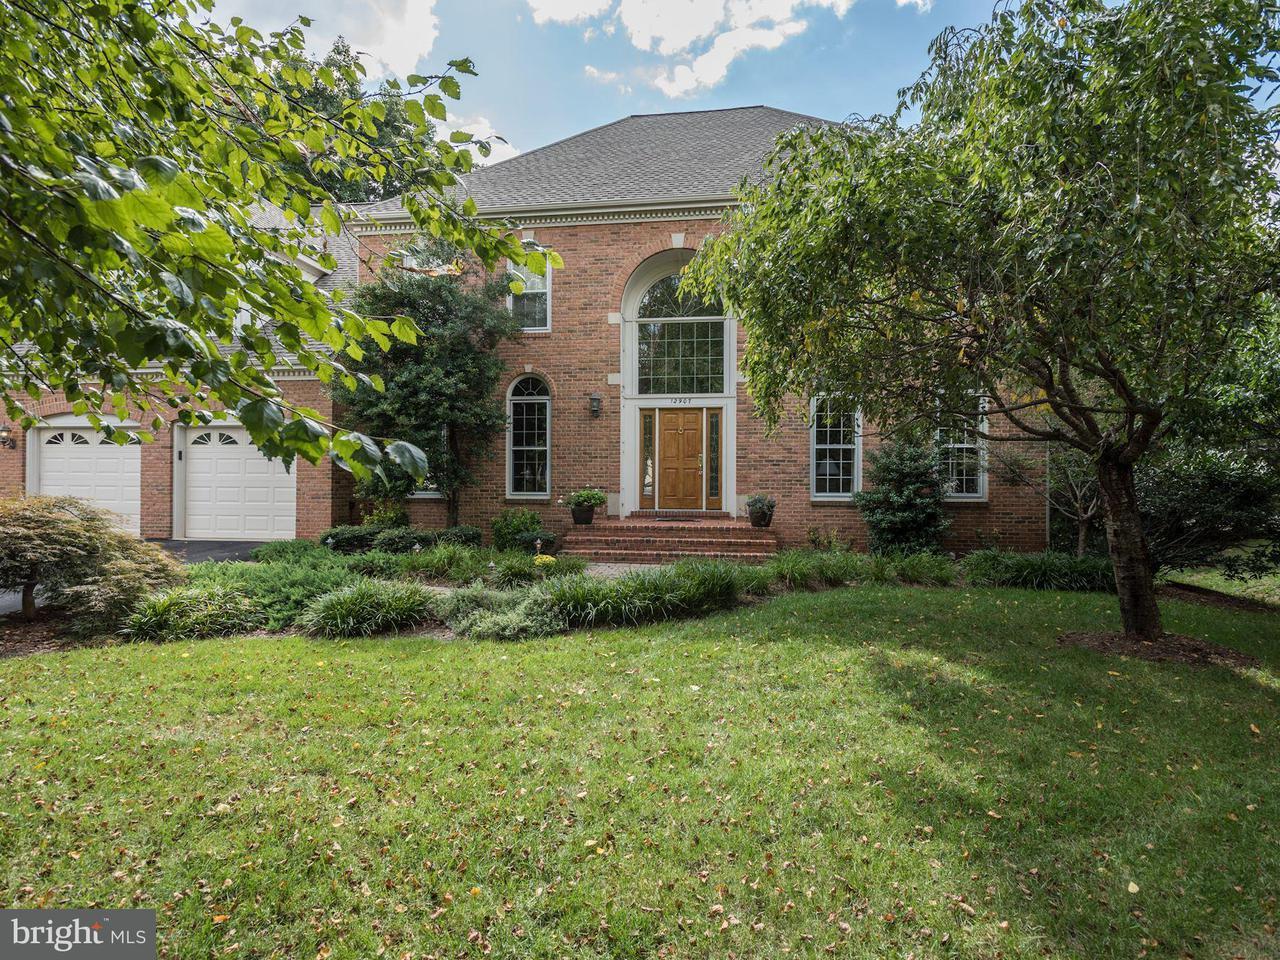 Single Family Home for Sale at 12907 Harrington Court 12907 Harrington Court Herndon, Virginia 20171 United States